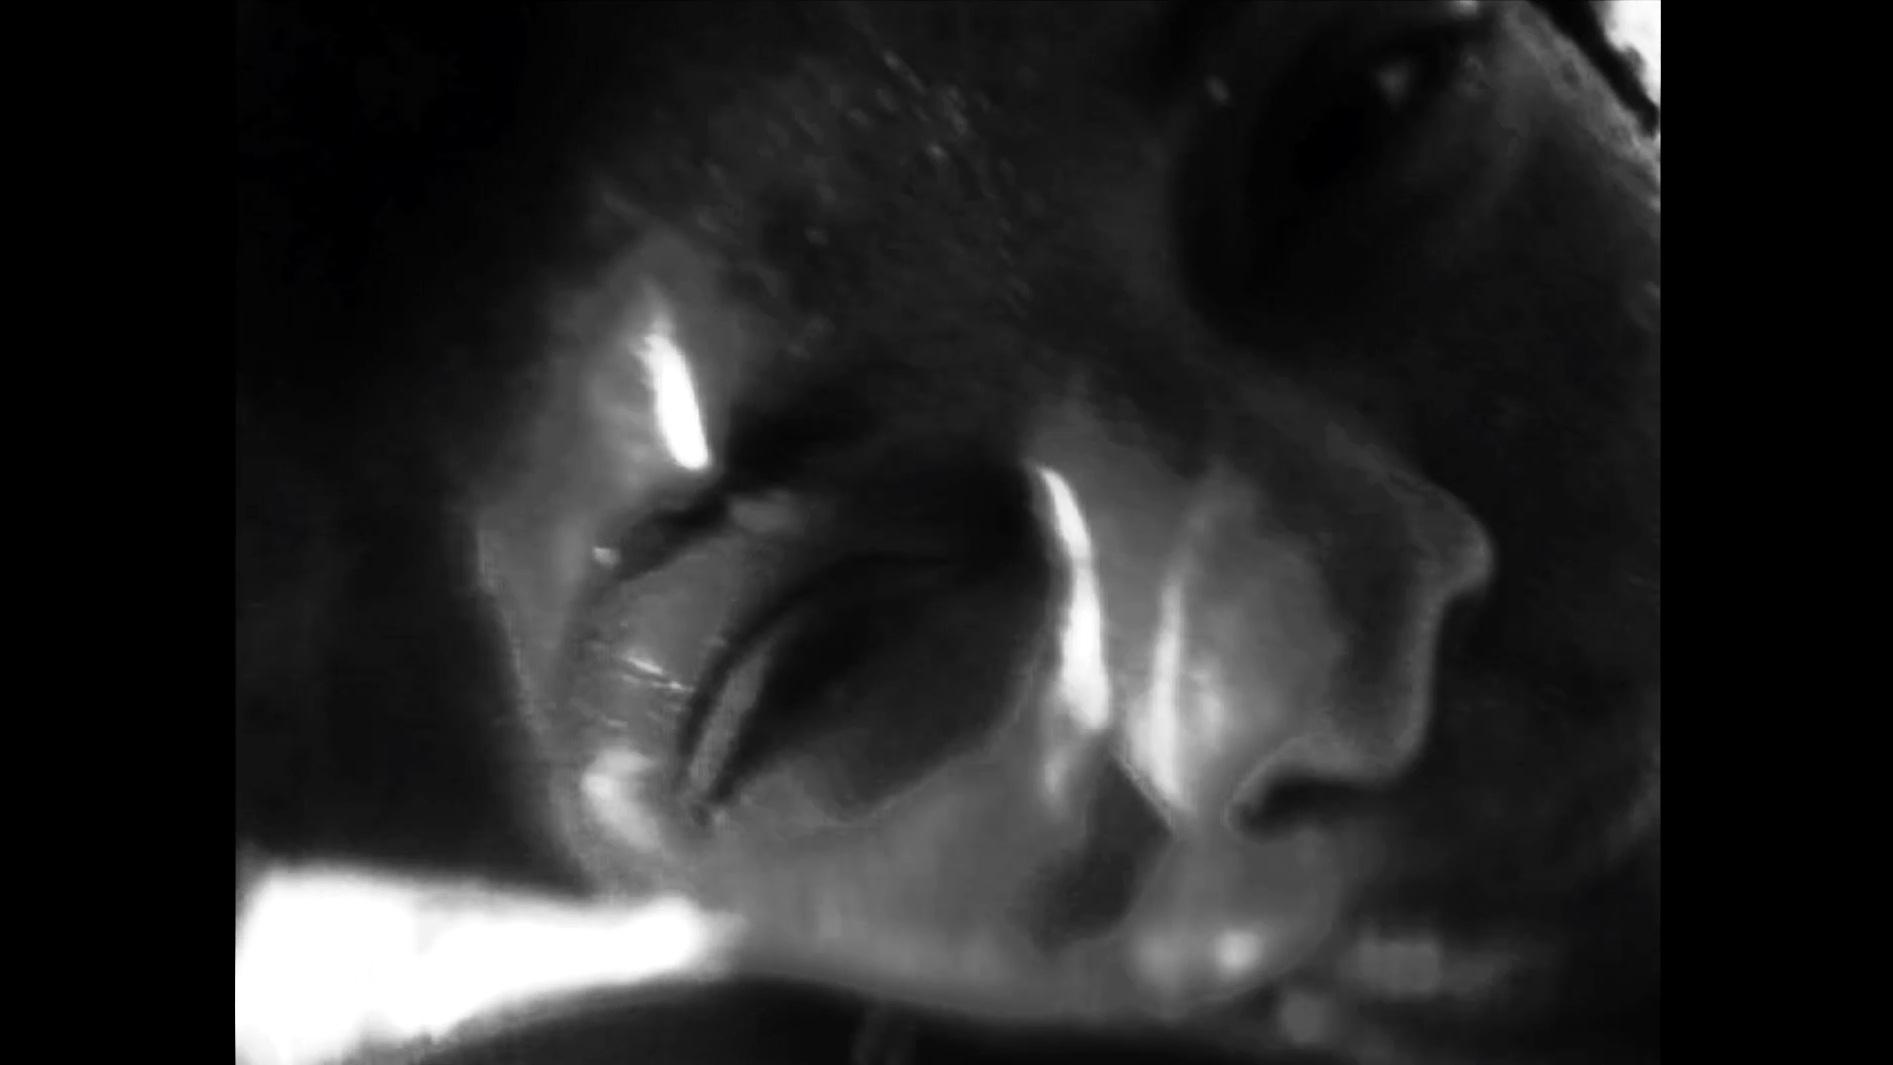 18.02.2019 - Lazara Rosell Albear - 'Yoko Osha_Volume II'+ Mary Jimenez - 'Face Deal'Het Bos, Antwerp - 20u30 / €5